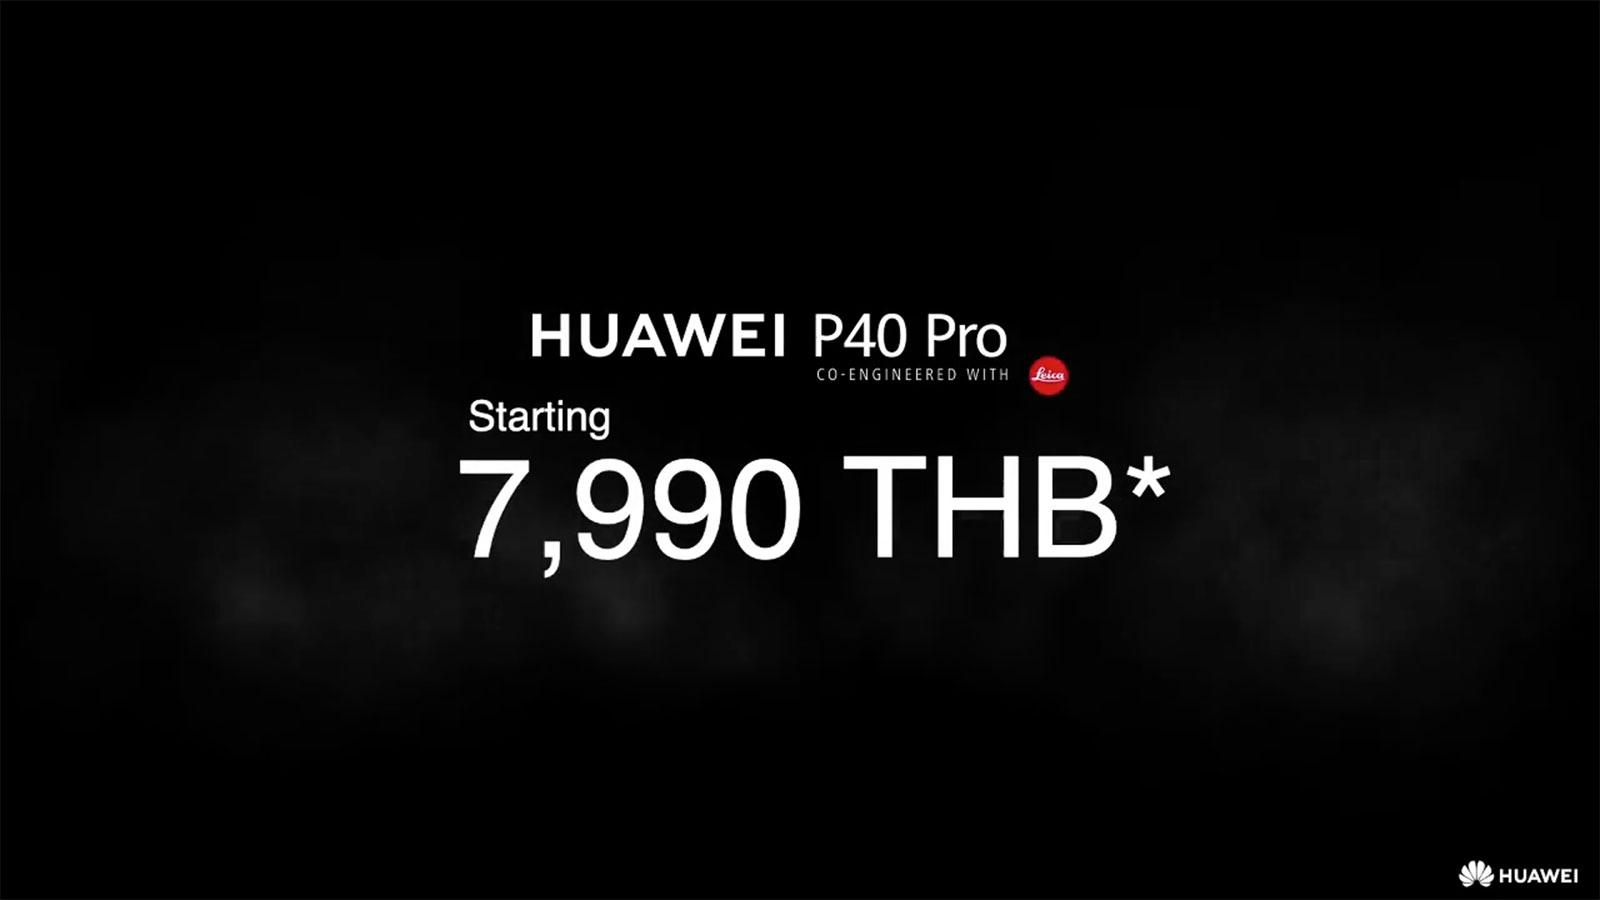 Huawei-P40-Pro-Pro-Price-Promotion-Operator